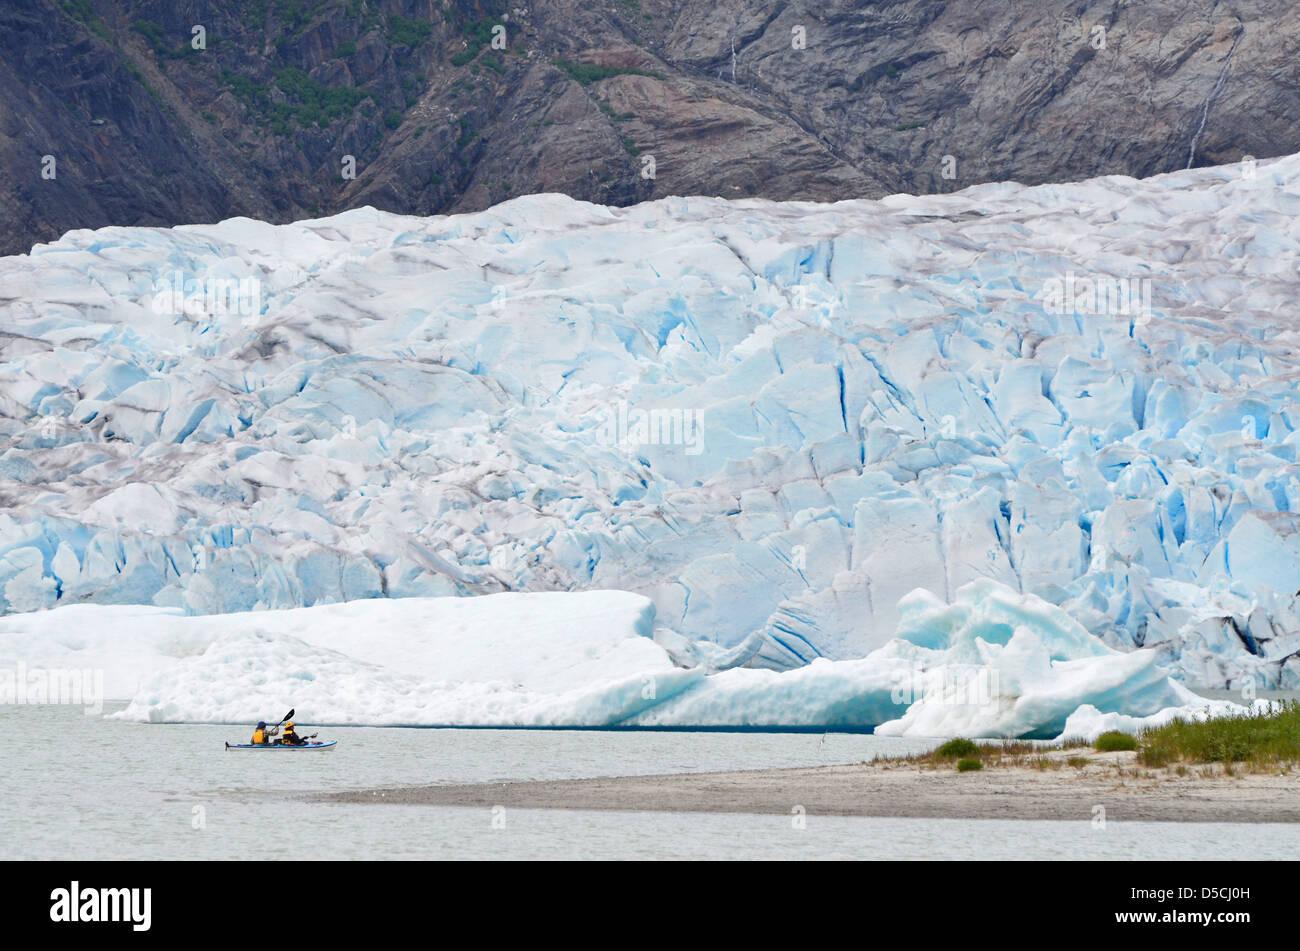 Sea kayaking below the Mendenhall Glacier in Southeast Alaska. - Stock Image